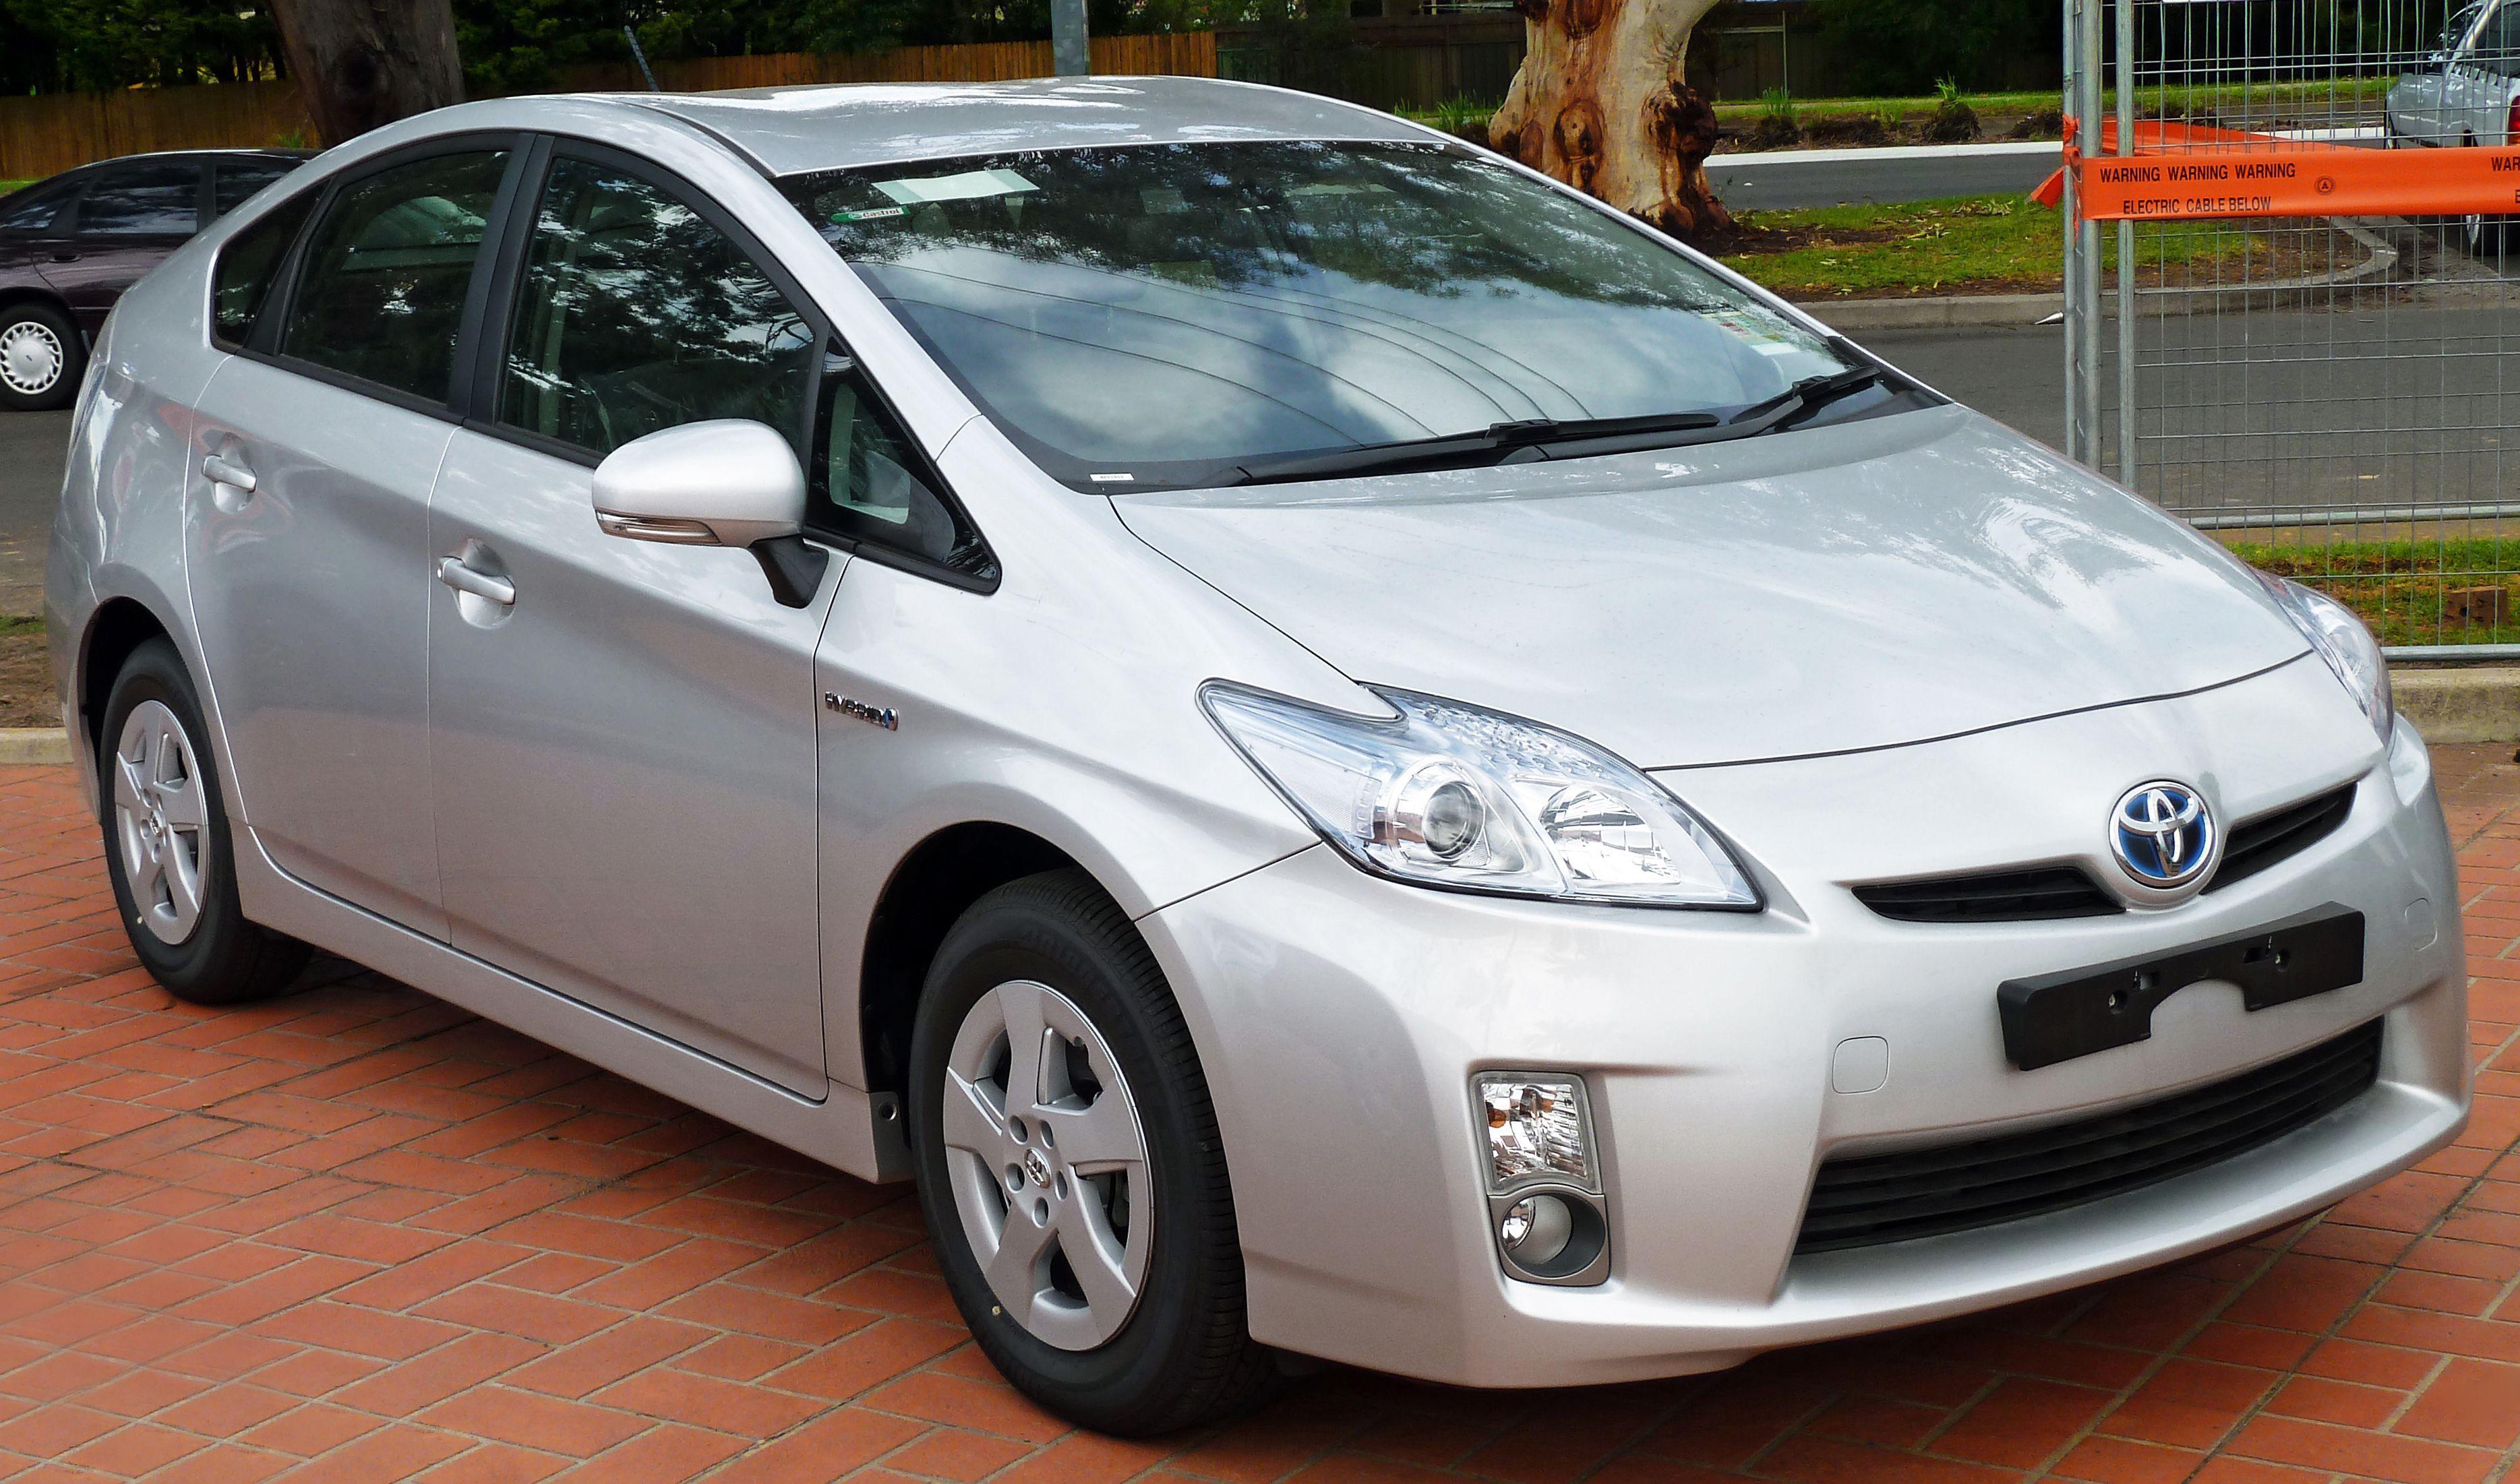 Toyota Prius Wallpaper